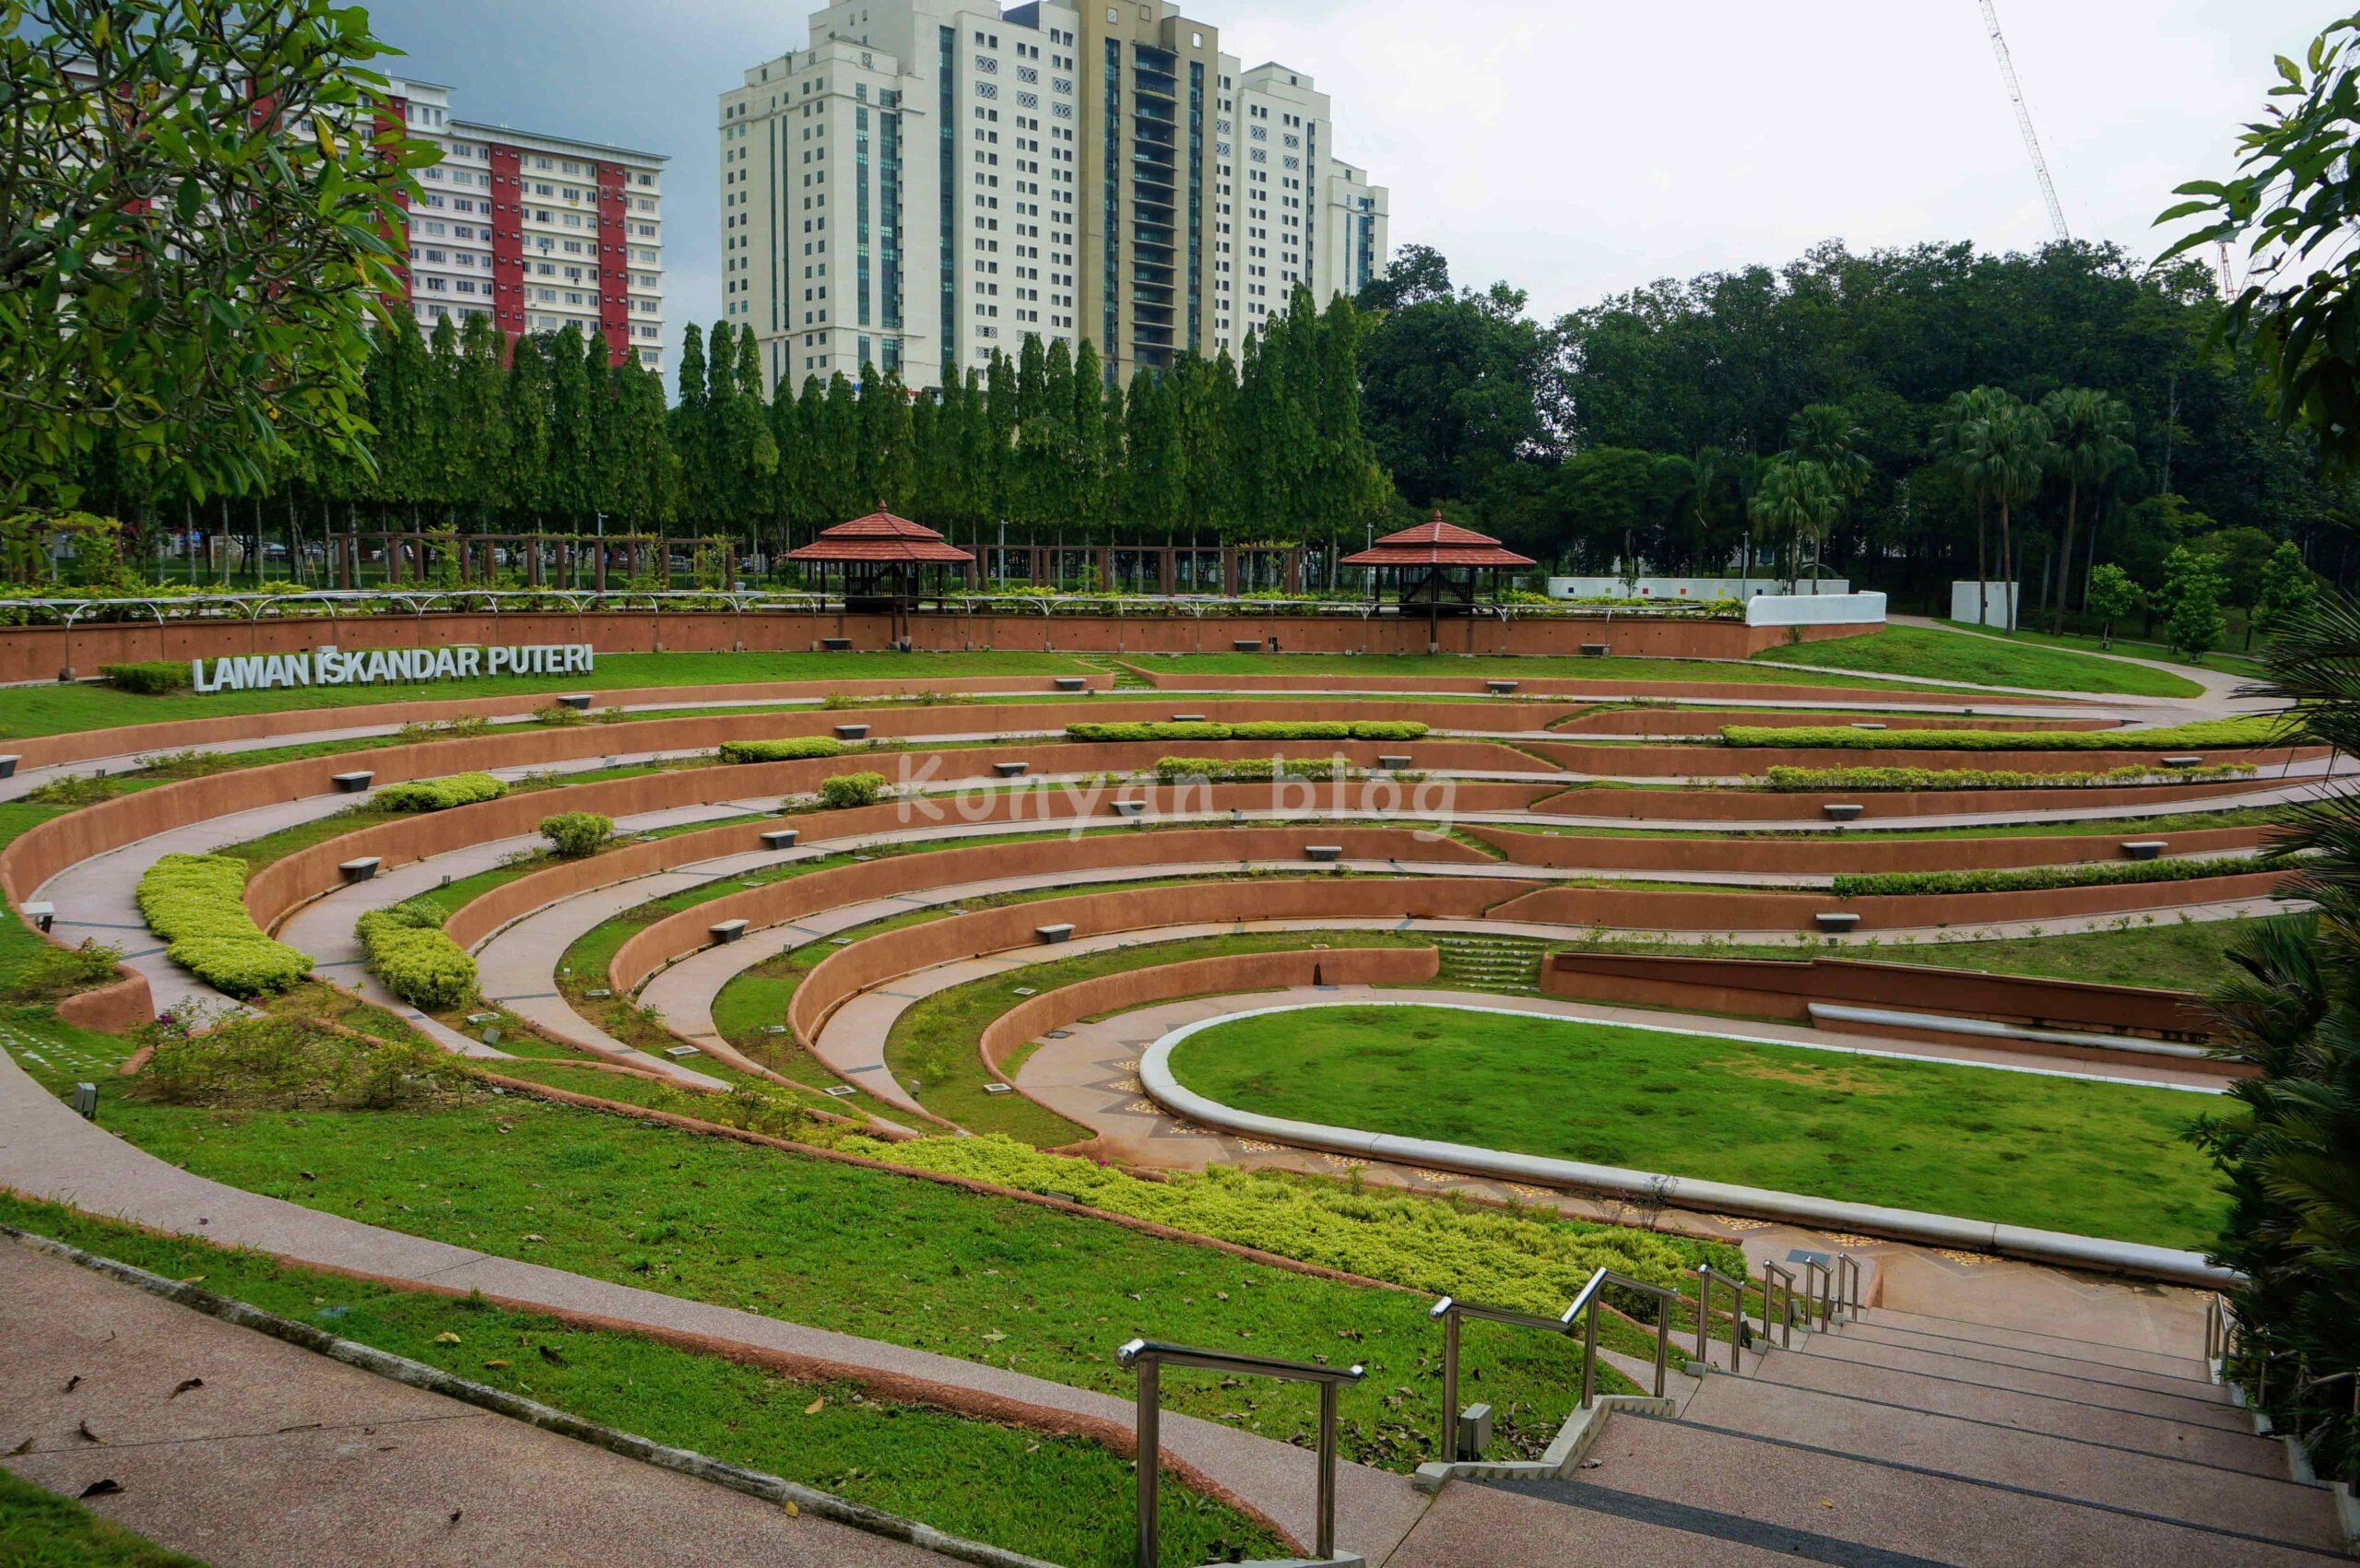 Taman Tasik Permaisuri 公園 広場